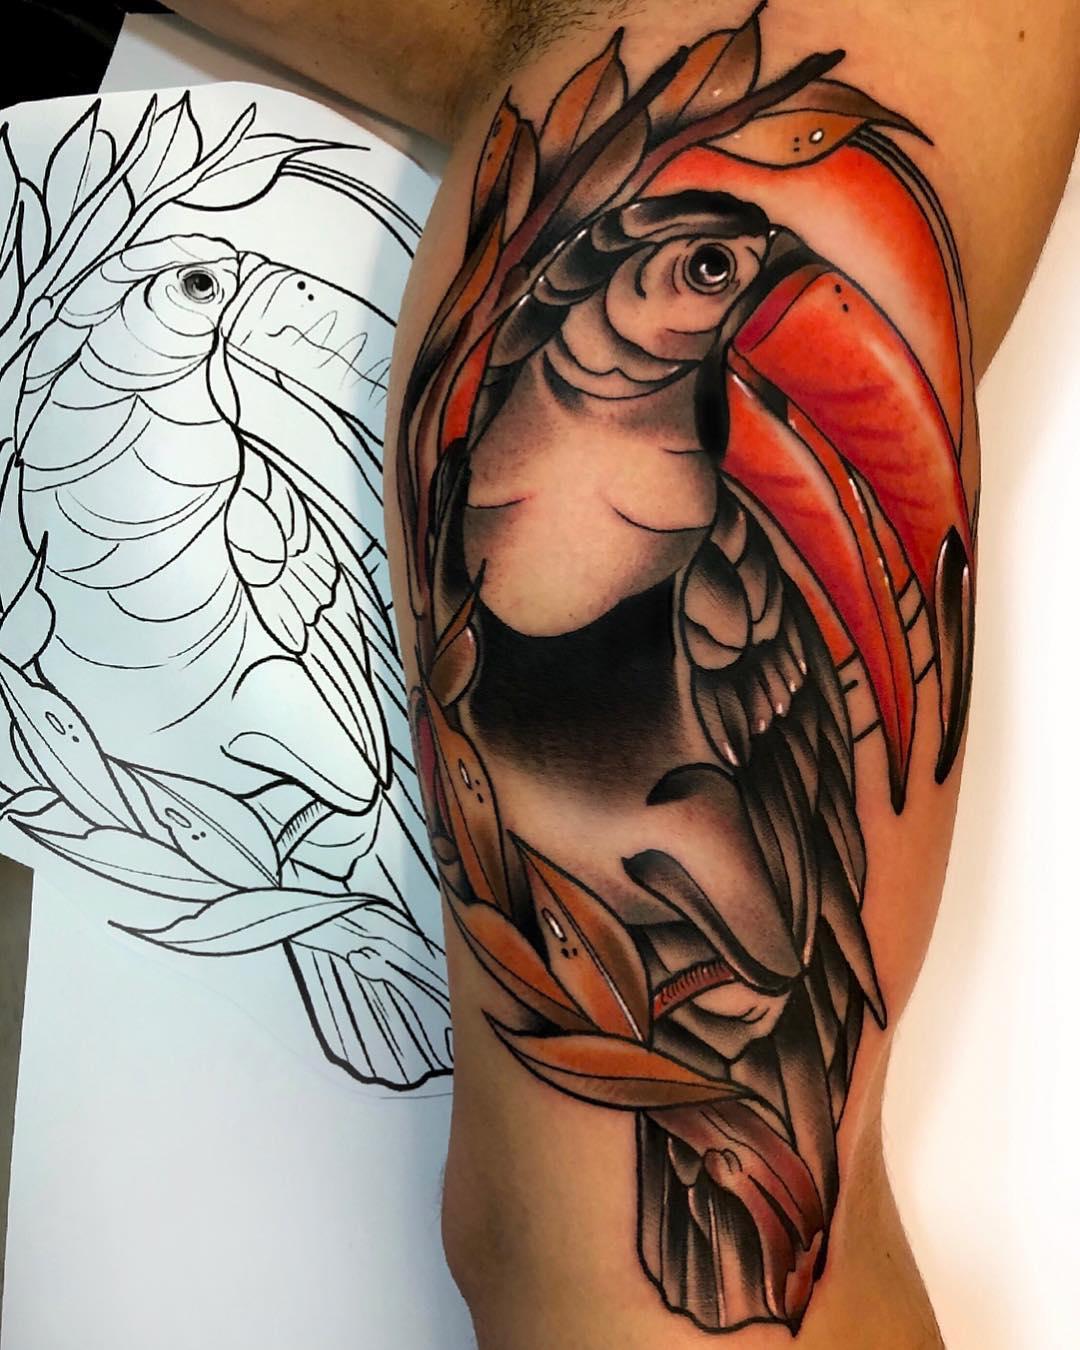 neotraditionaltattoo,followforfollow,berlin,followmeciudadreal,ciudadreal,tomelloso,almagro,puertollano,tatuajesenpuertollano,tatuajesendaimiel,ciudadrealtattoo,ciudadrealtatuajes,tatuajesciudadreal,follow,ciudadrealtatuajes,puertollano,ciudadreal,tattoos,ciudadrealtattoo,tattooers,besttattooers,juantabasco,ciudadrealsetatua,ink,tatuajes,realismo,realistictattoo,ciudadrealtattoo,tatuajesenpuertollano,traditionaltattoos,castillalamancha,ink,tattooart,zurichtattoo,daimiel,blackandgreytattoo,daimiel